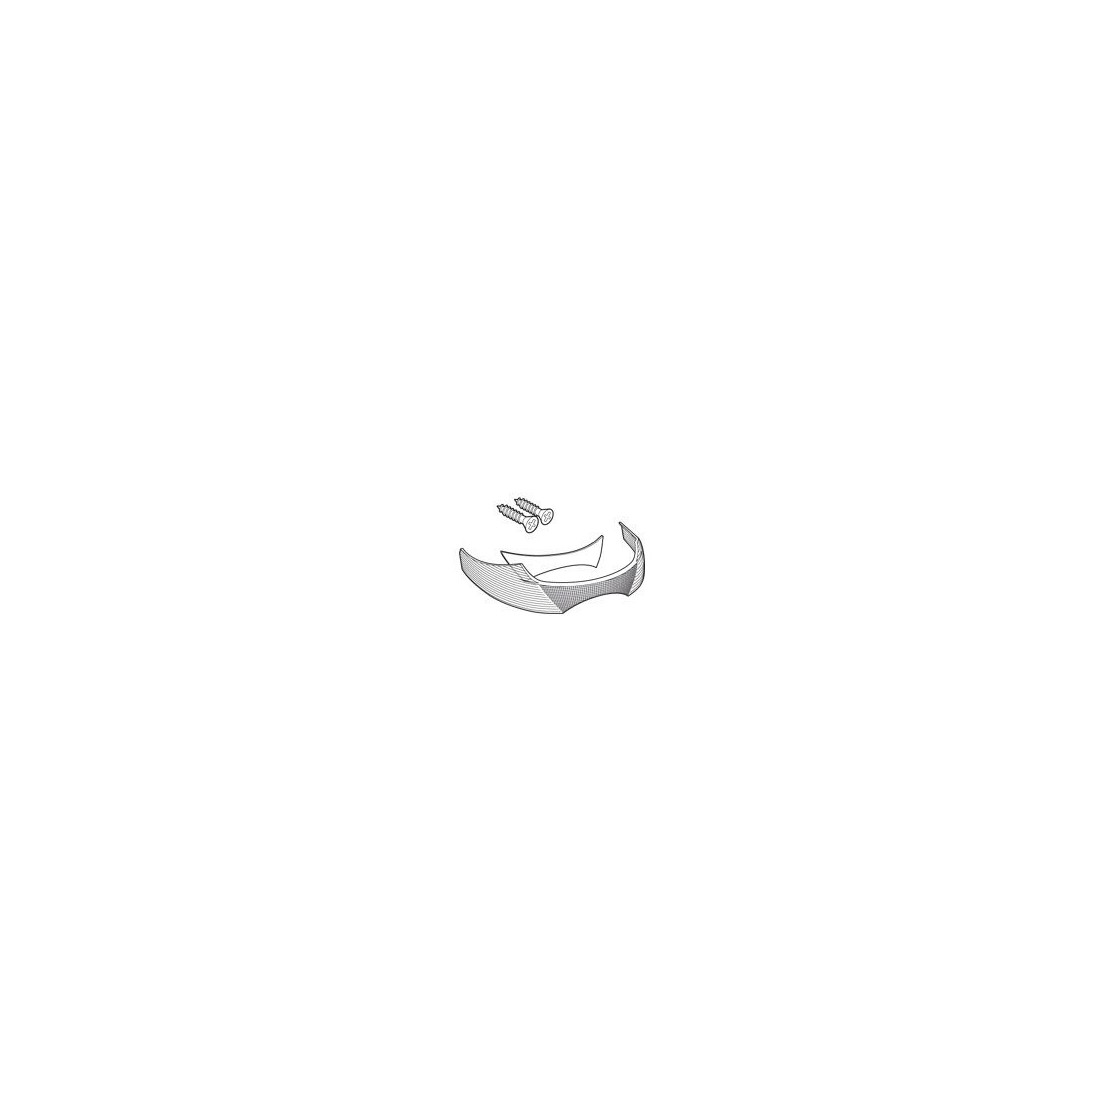 Catadrióptico Blanco Shad SH33